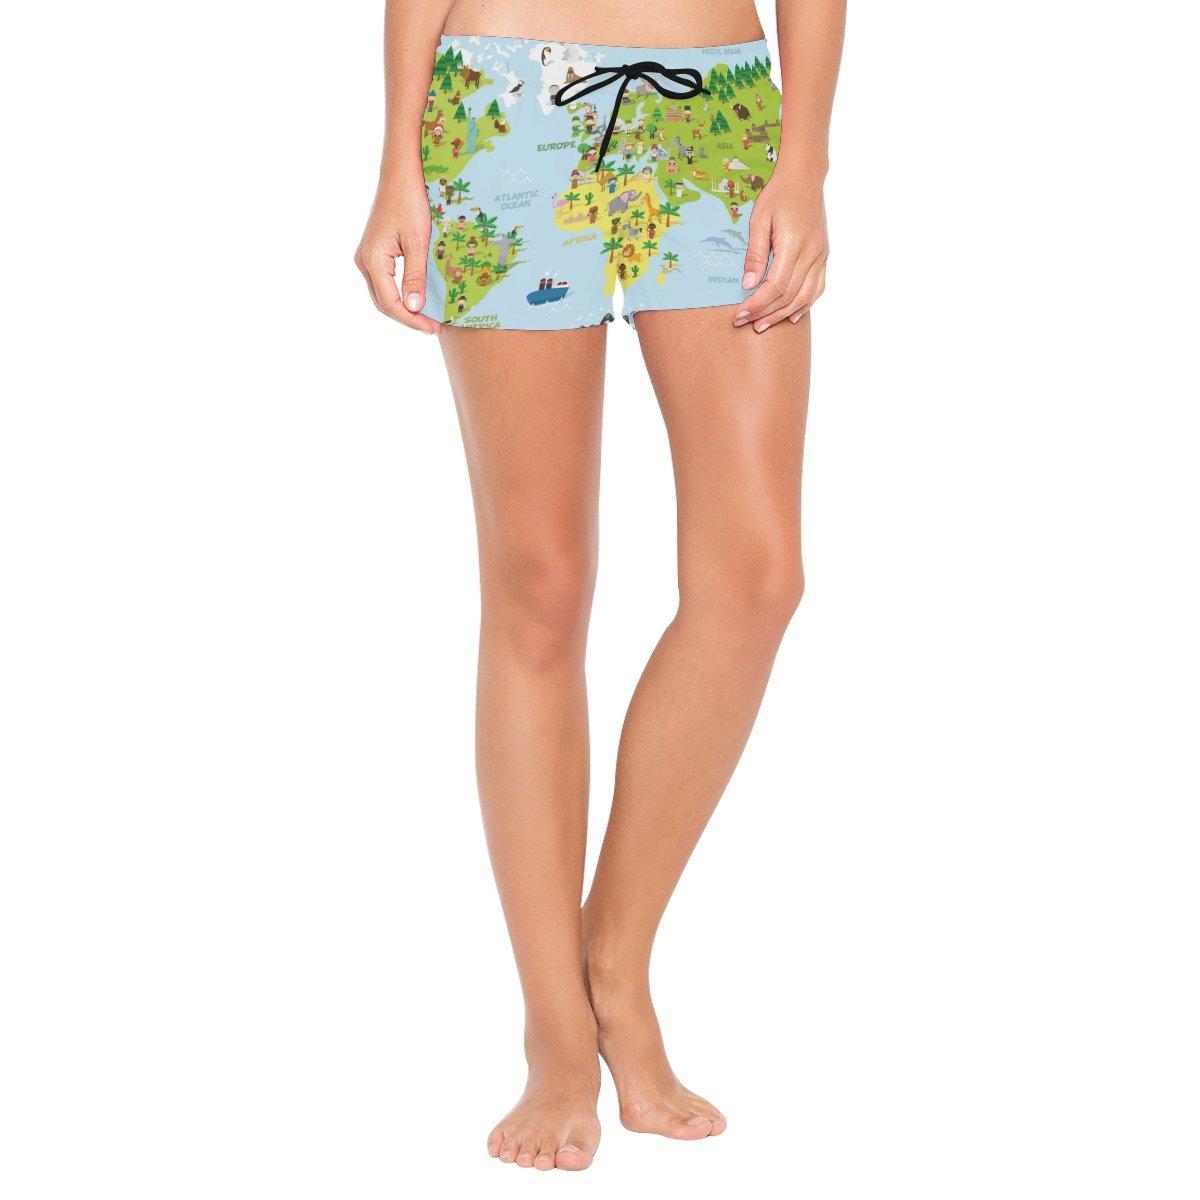 Cooper girl ALAZA Travel World Map Women's Shorts Beach Summer Drawstring Casual Shorts